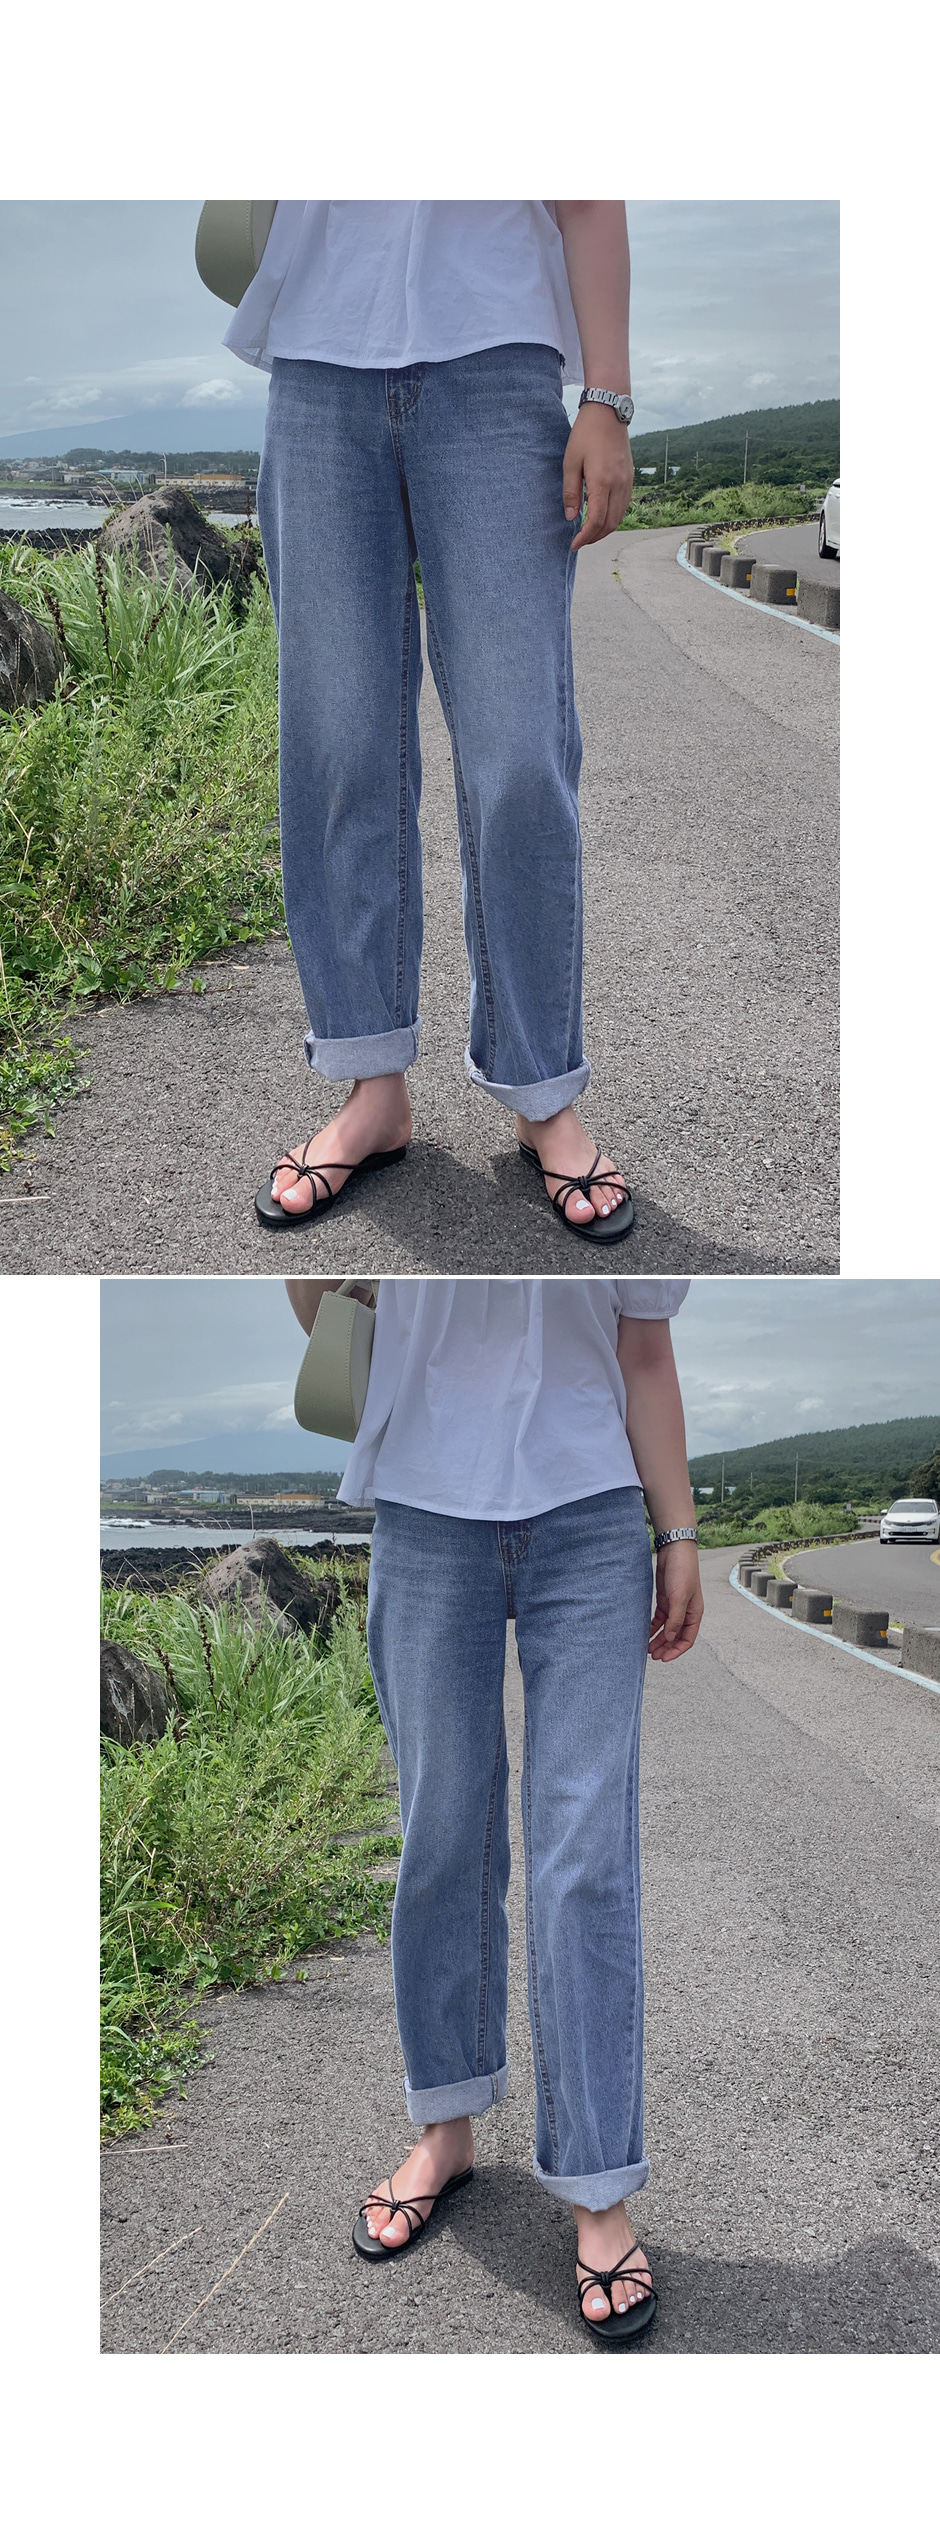 Breather Date Wide Long Denim Pants - 1 color